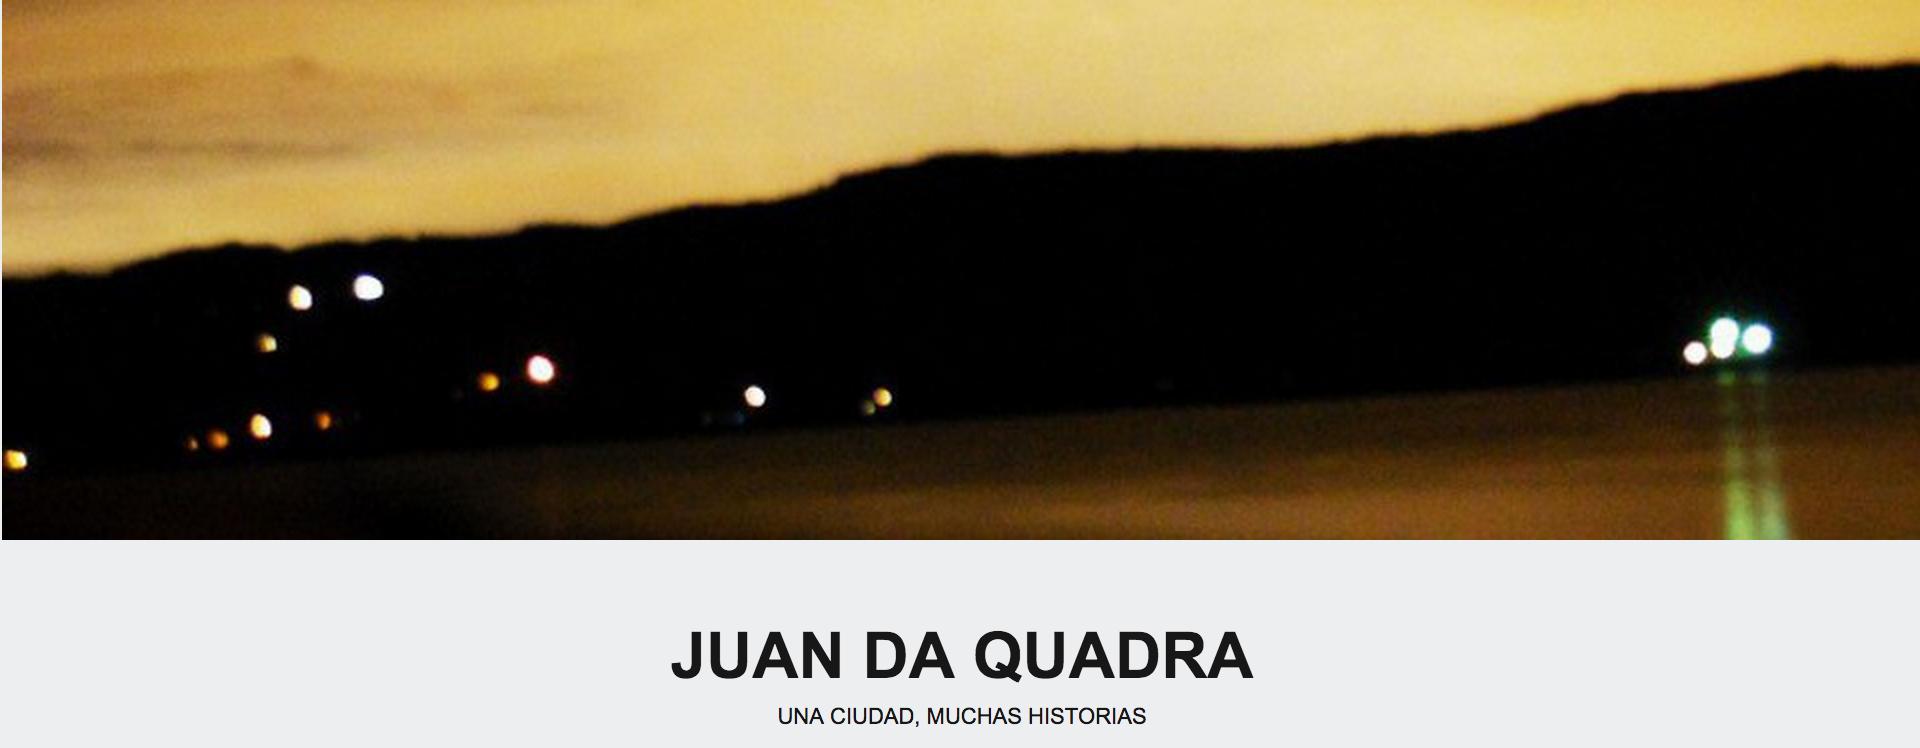 Juan Da Quadra